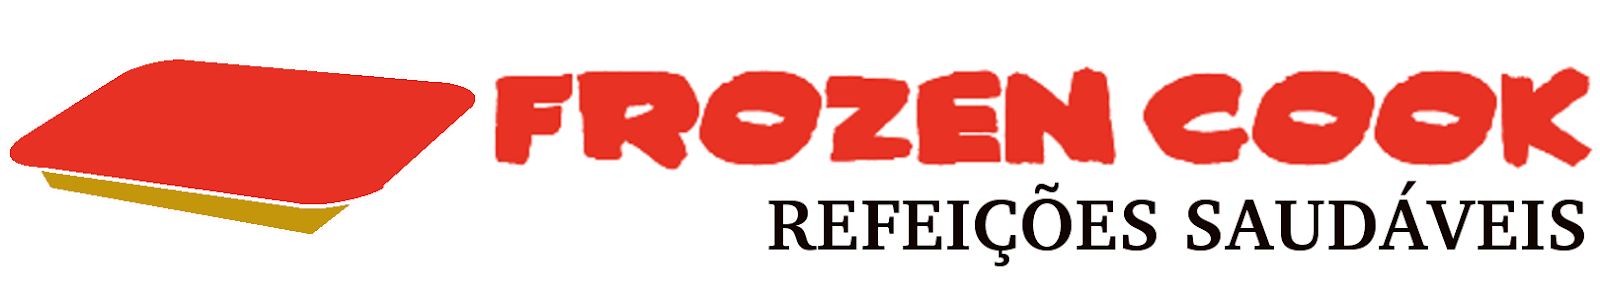 logotipo extenso.png